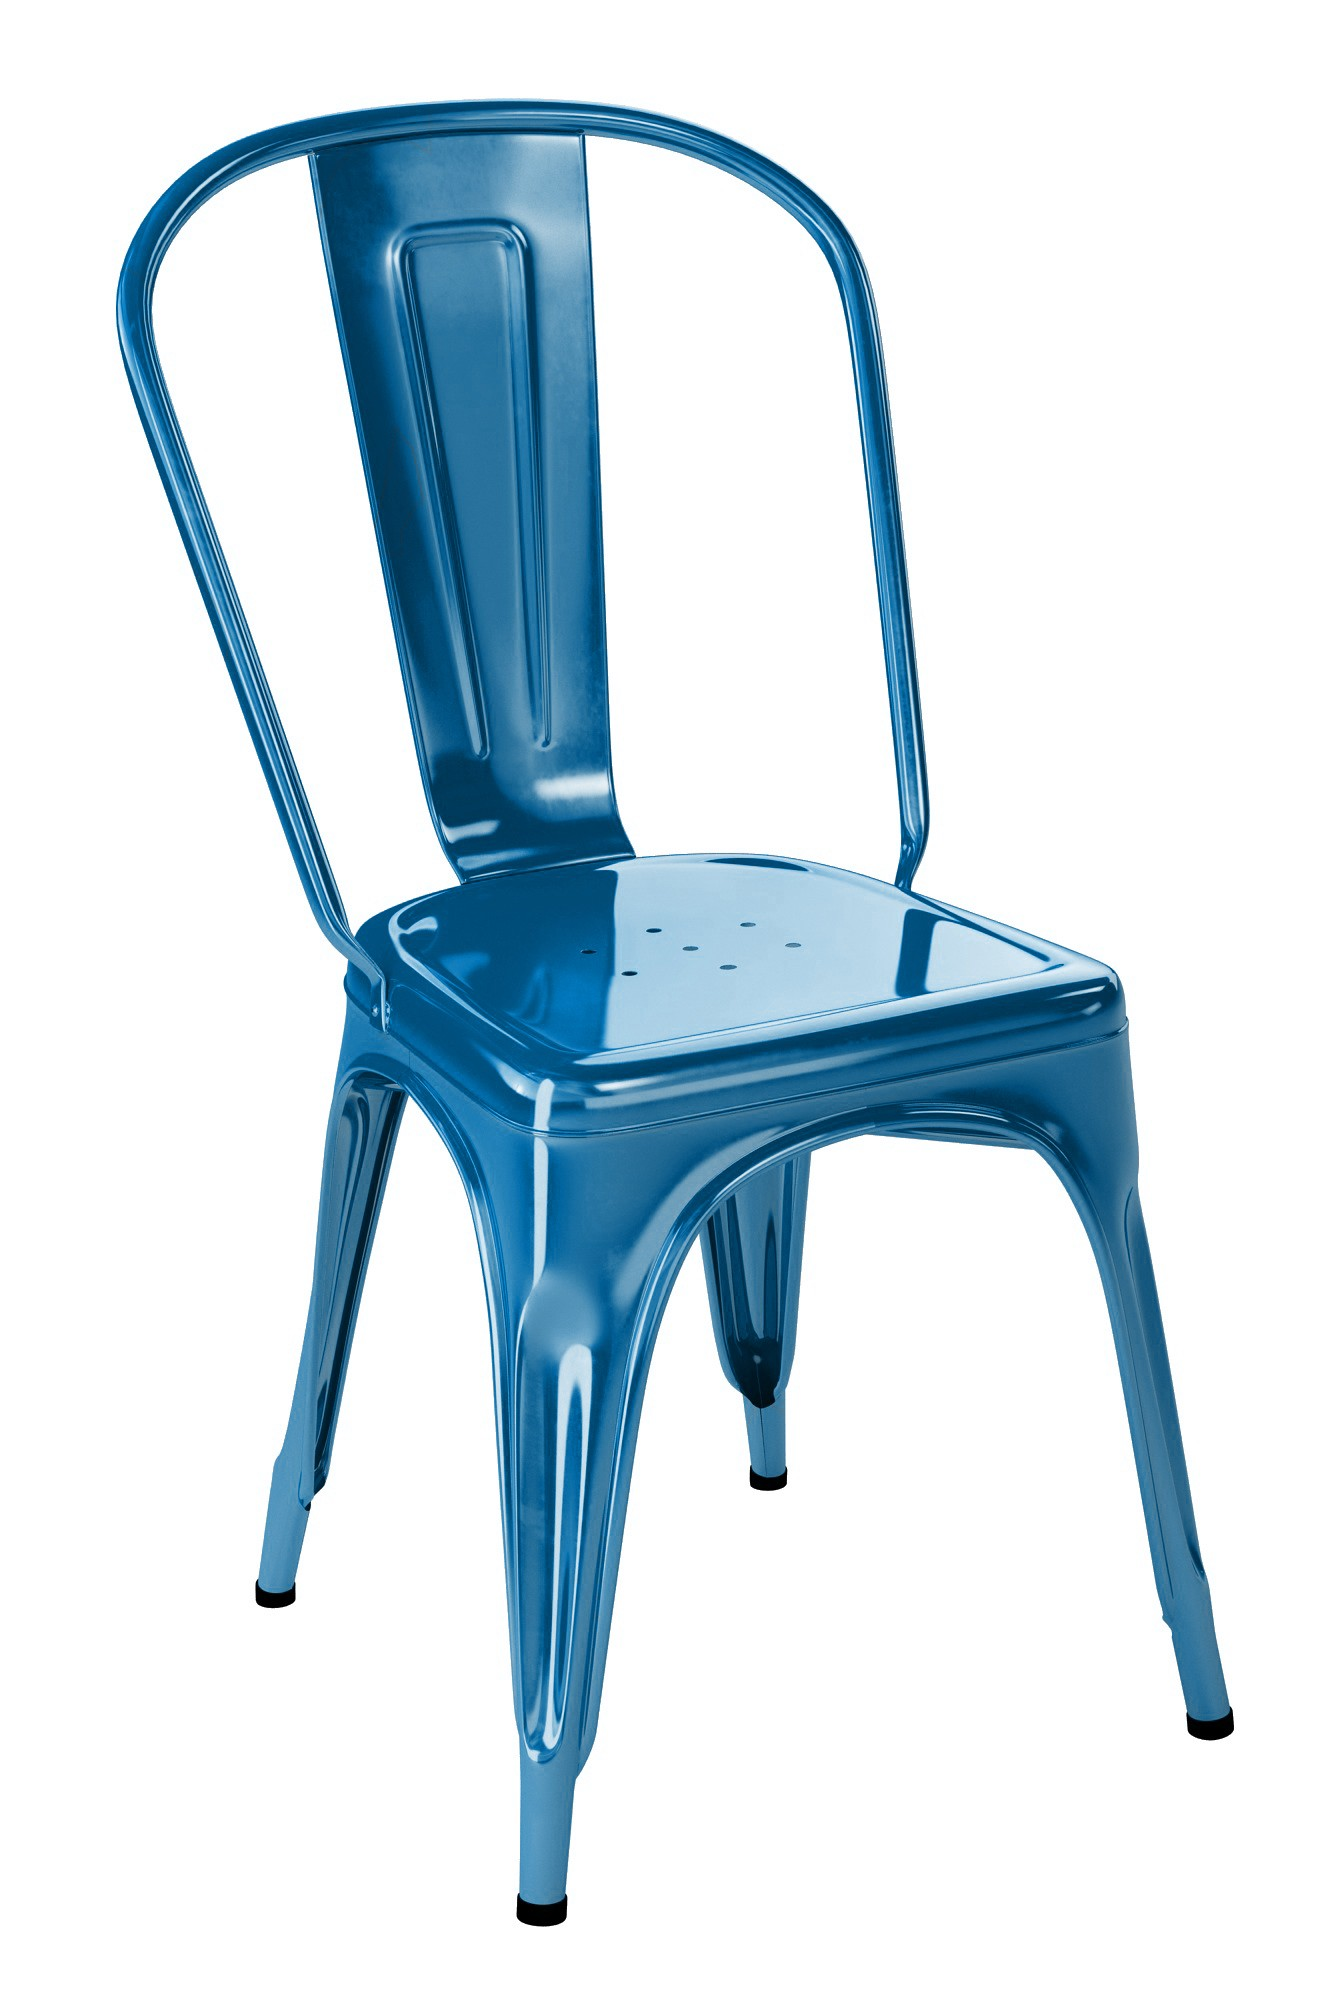 chaise a de tolix acier laqu 11 coloris. Black Bedroom Furniture Sets. Home Design Ideas